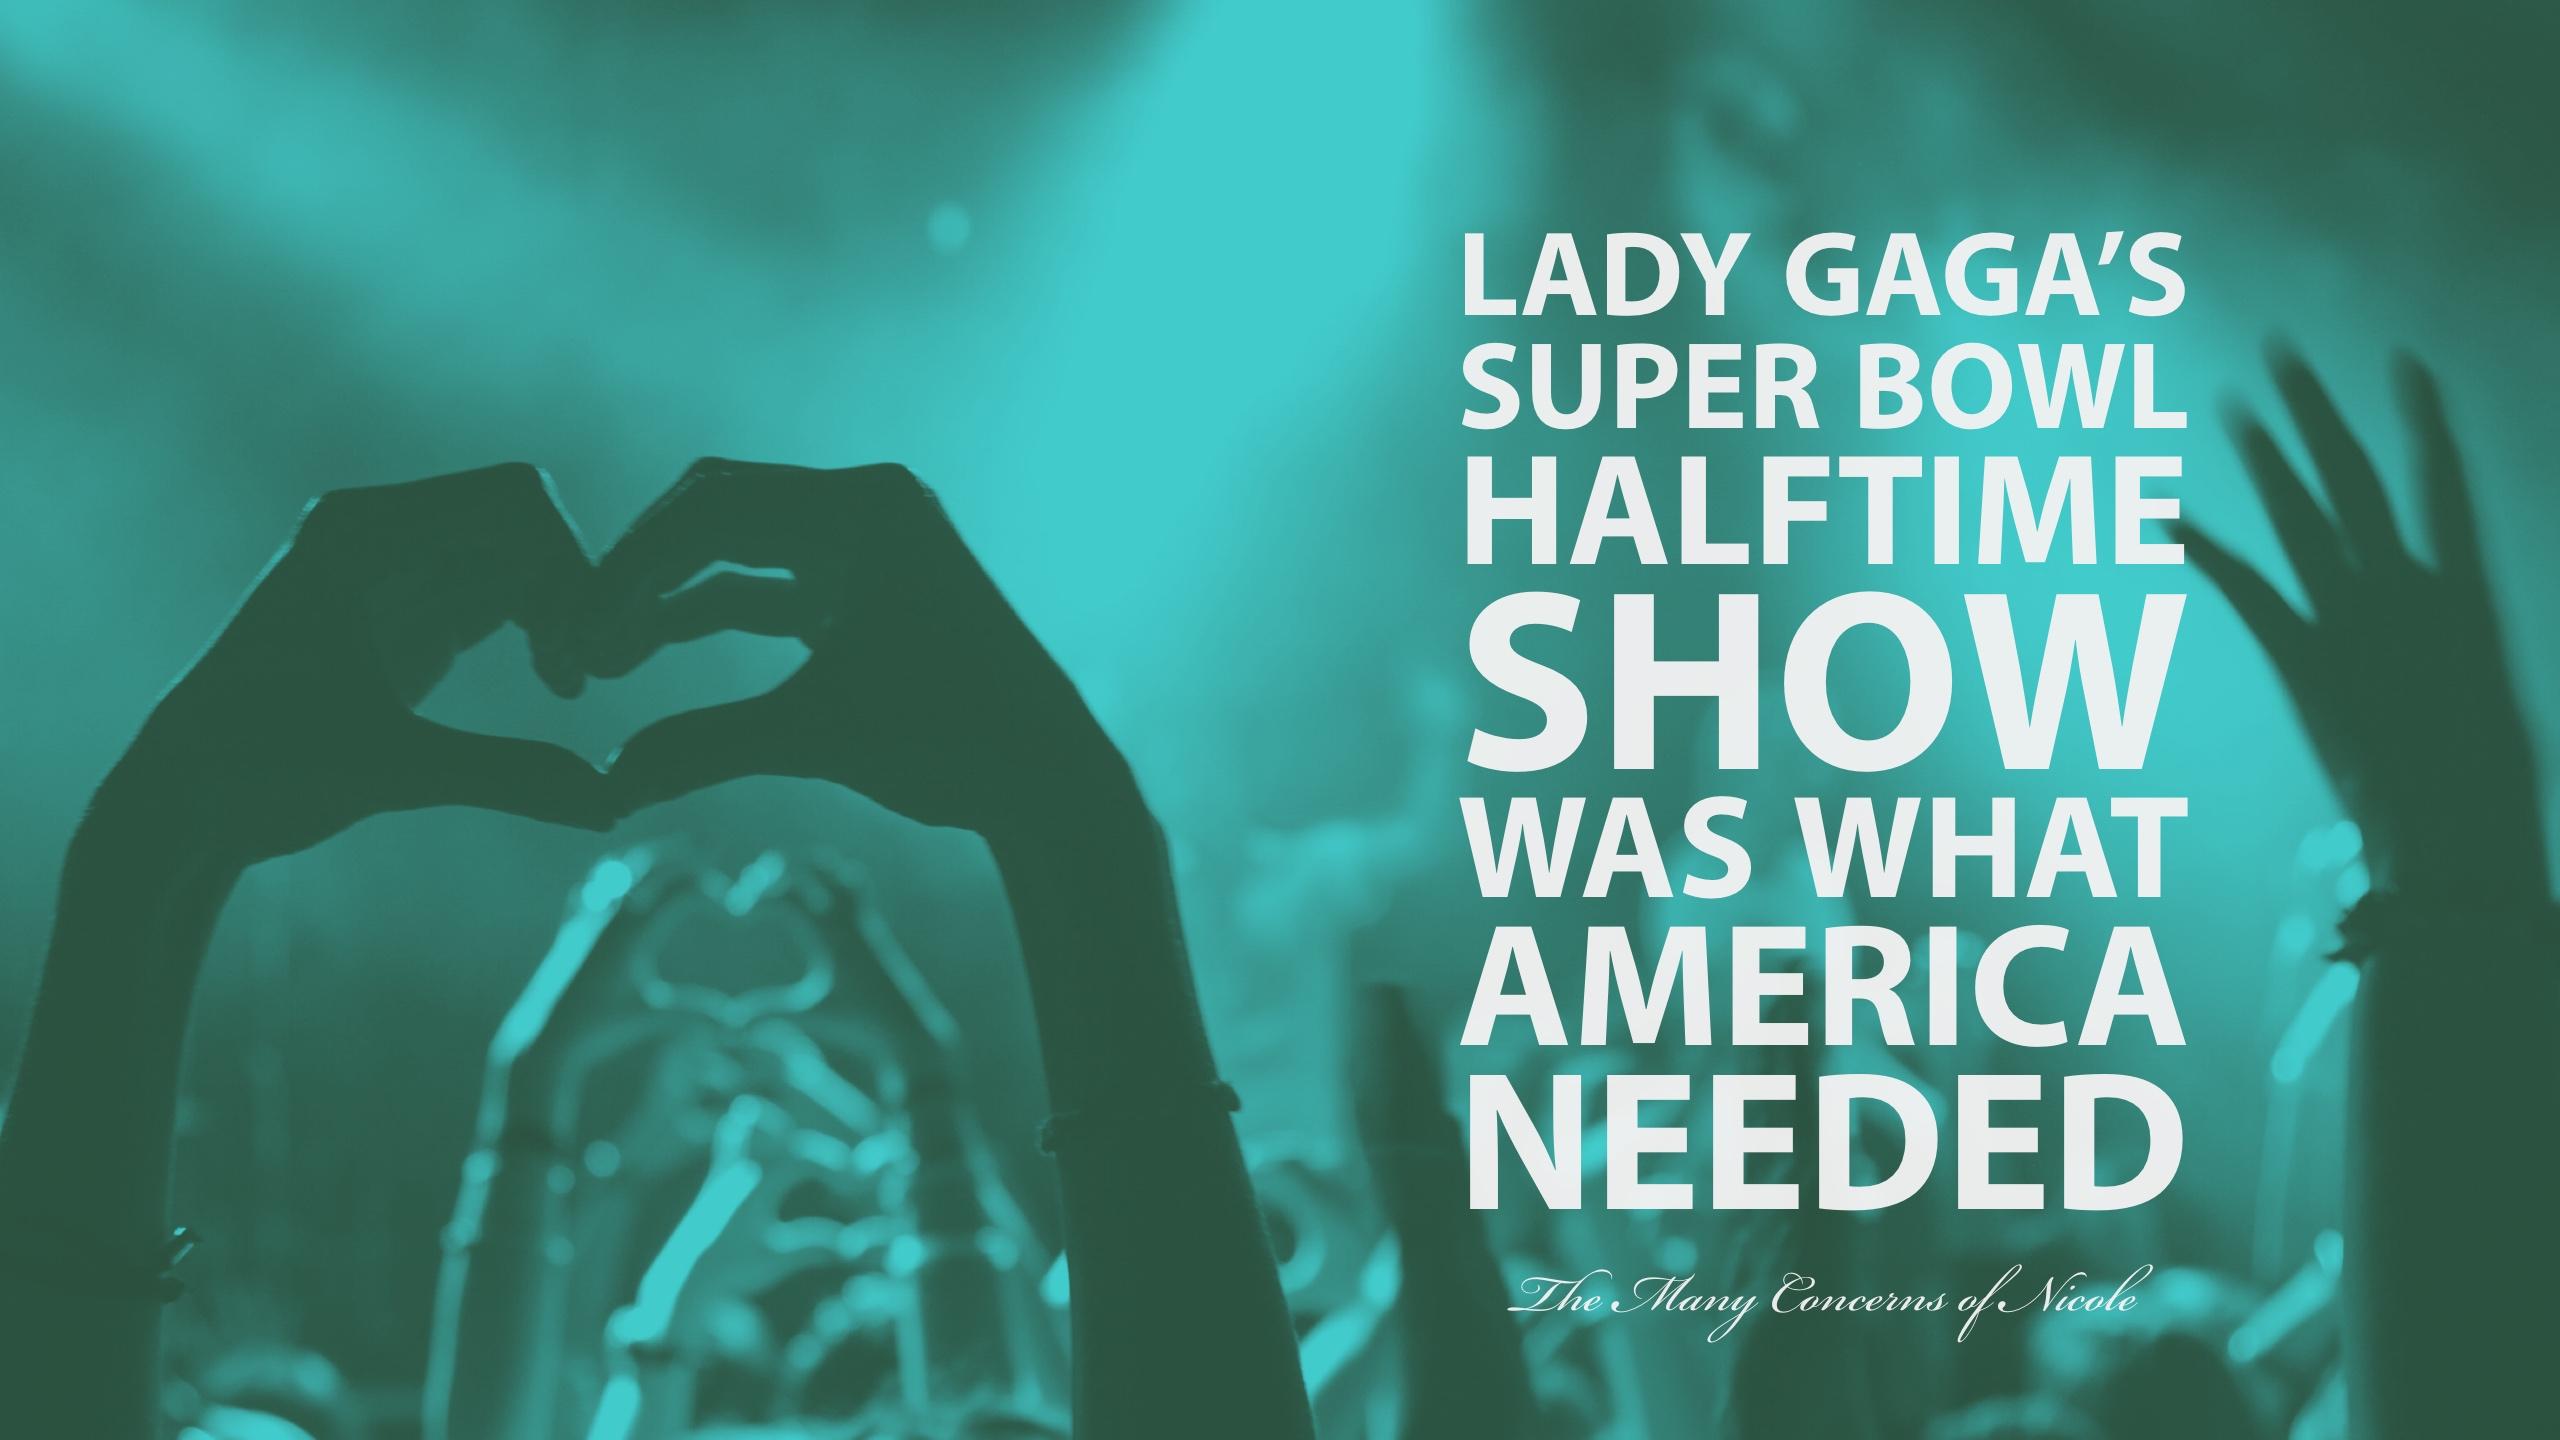 Gaga's Super Bowl